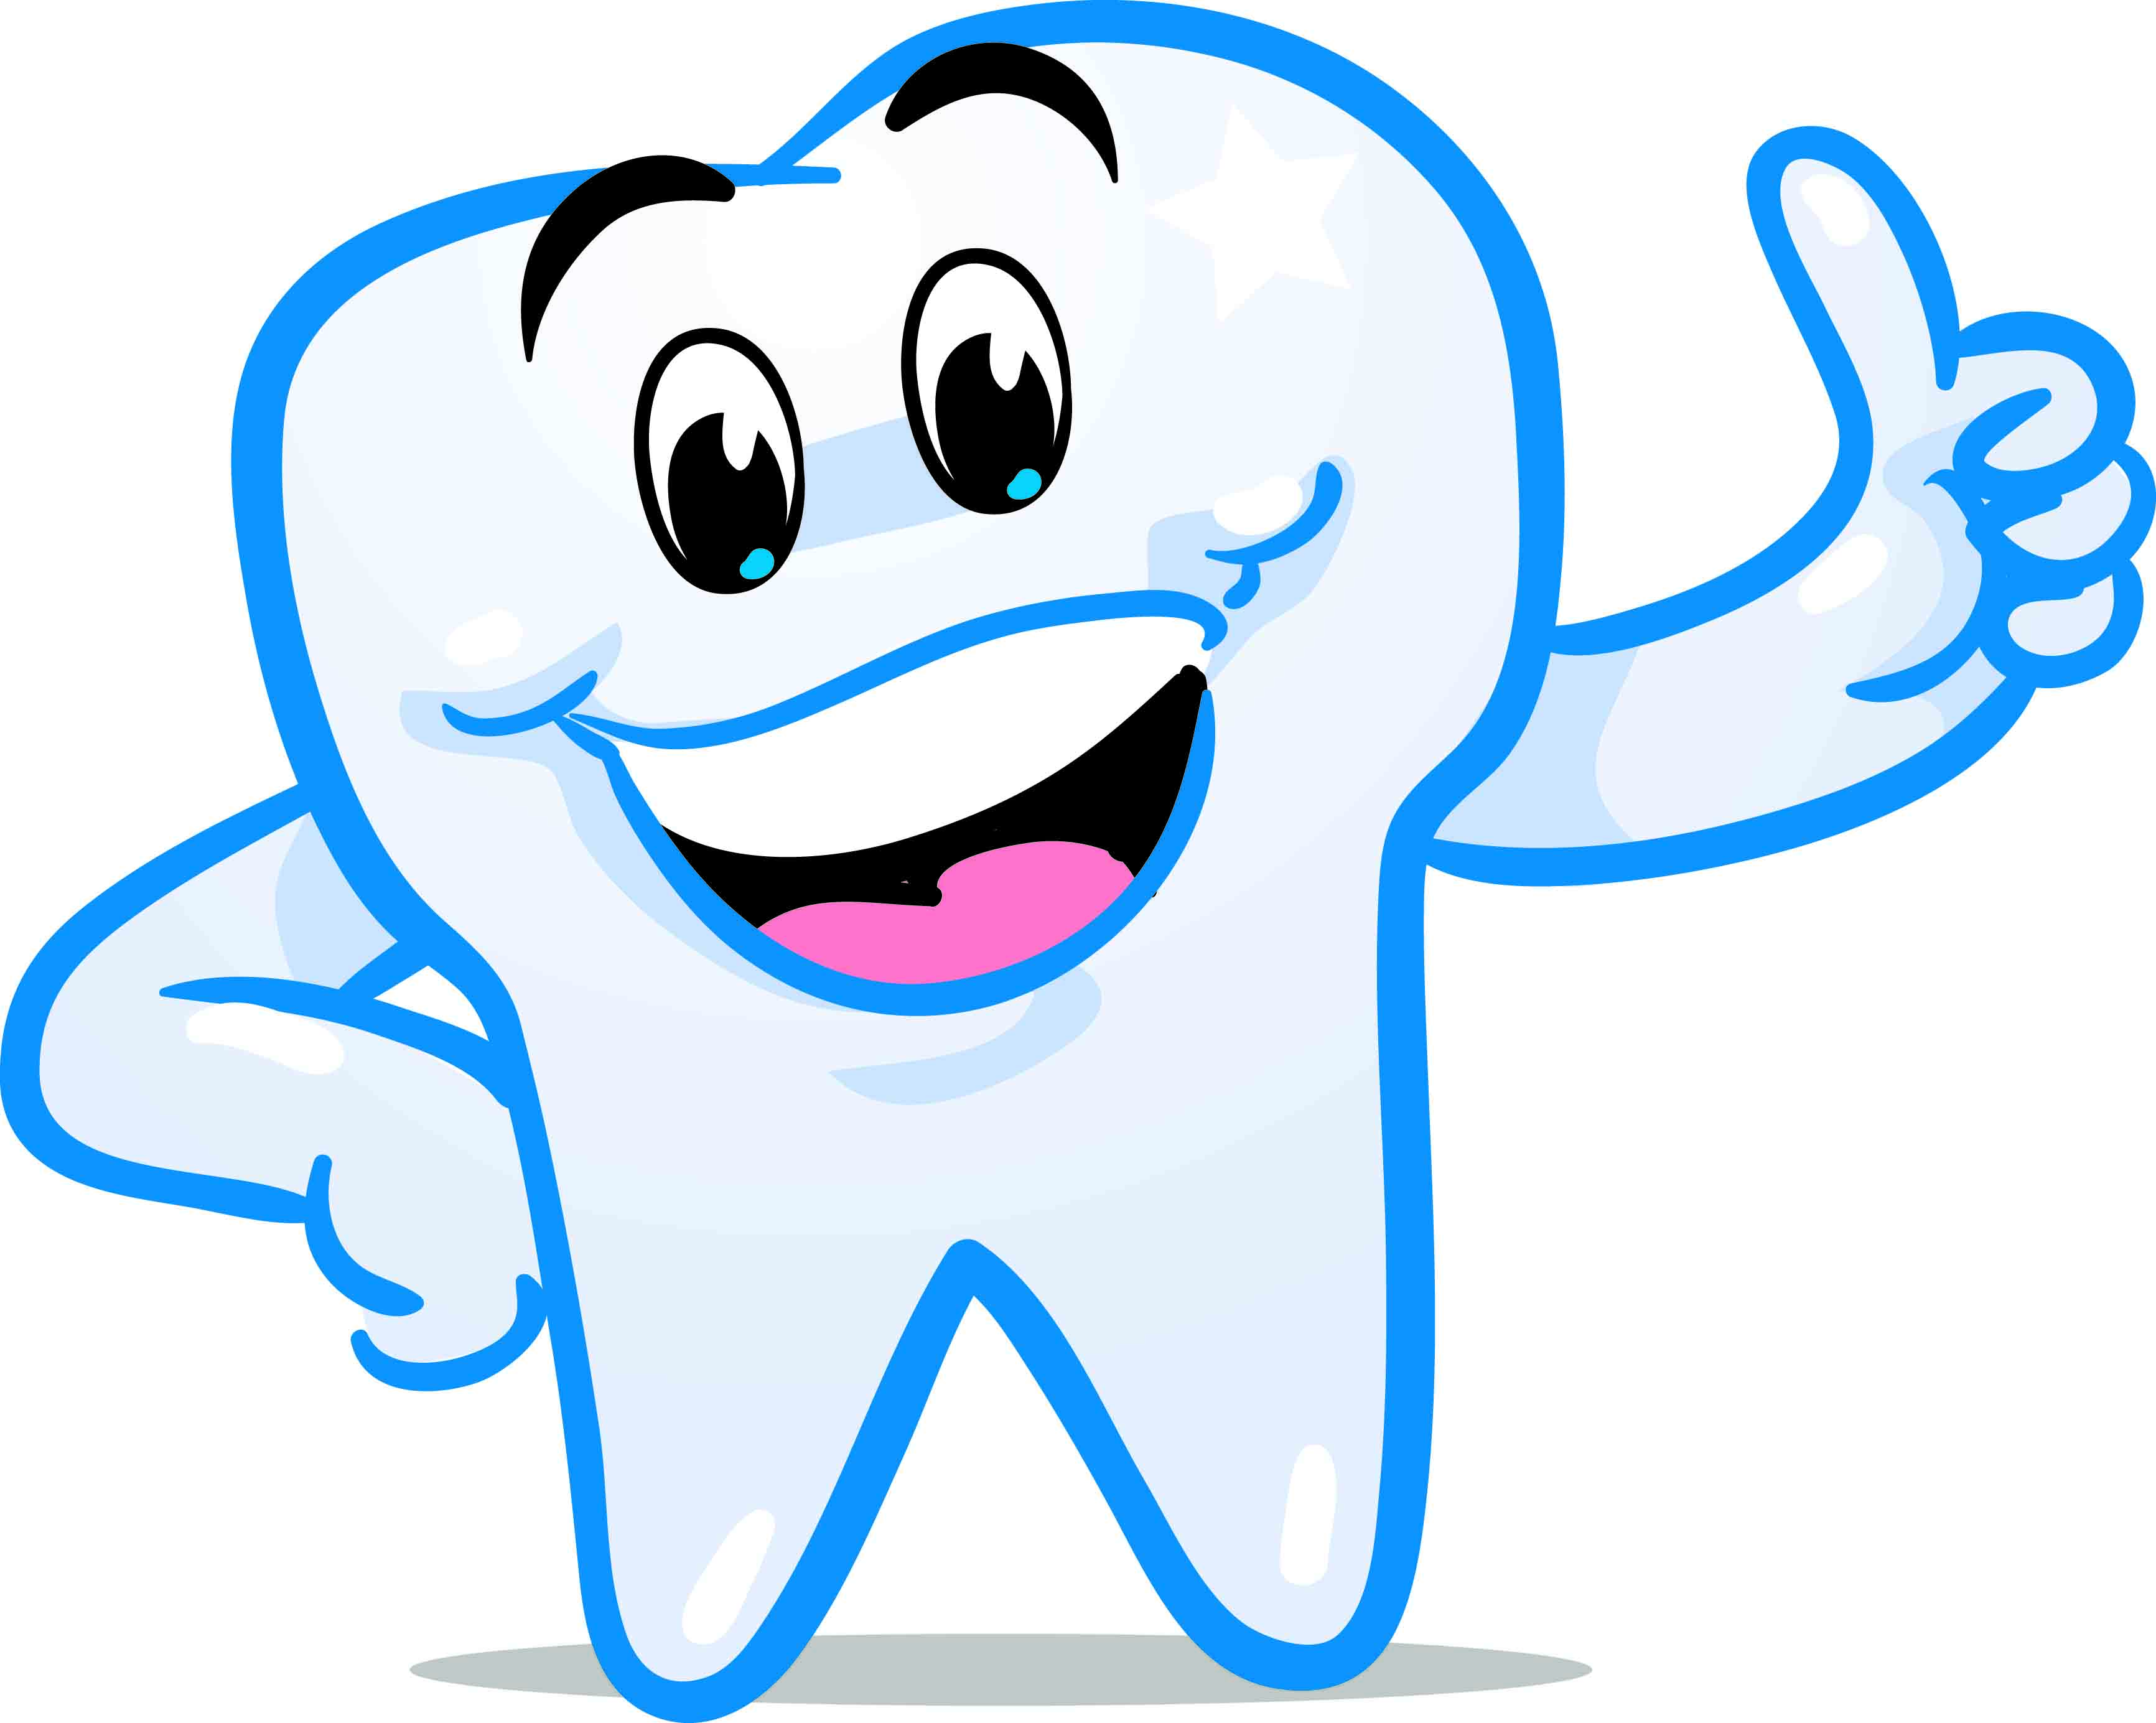 Grin clipart dental #1